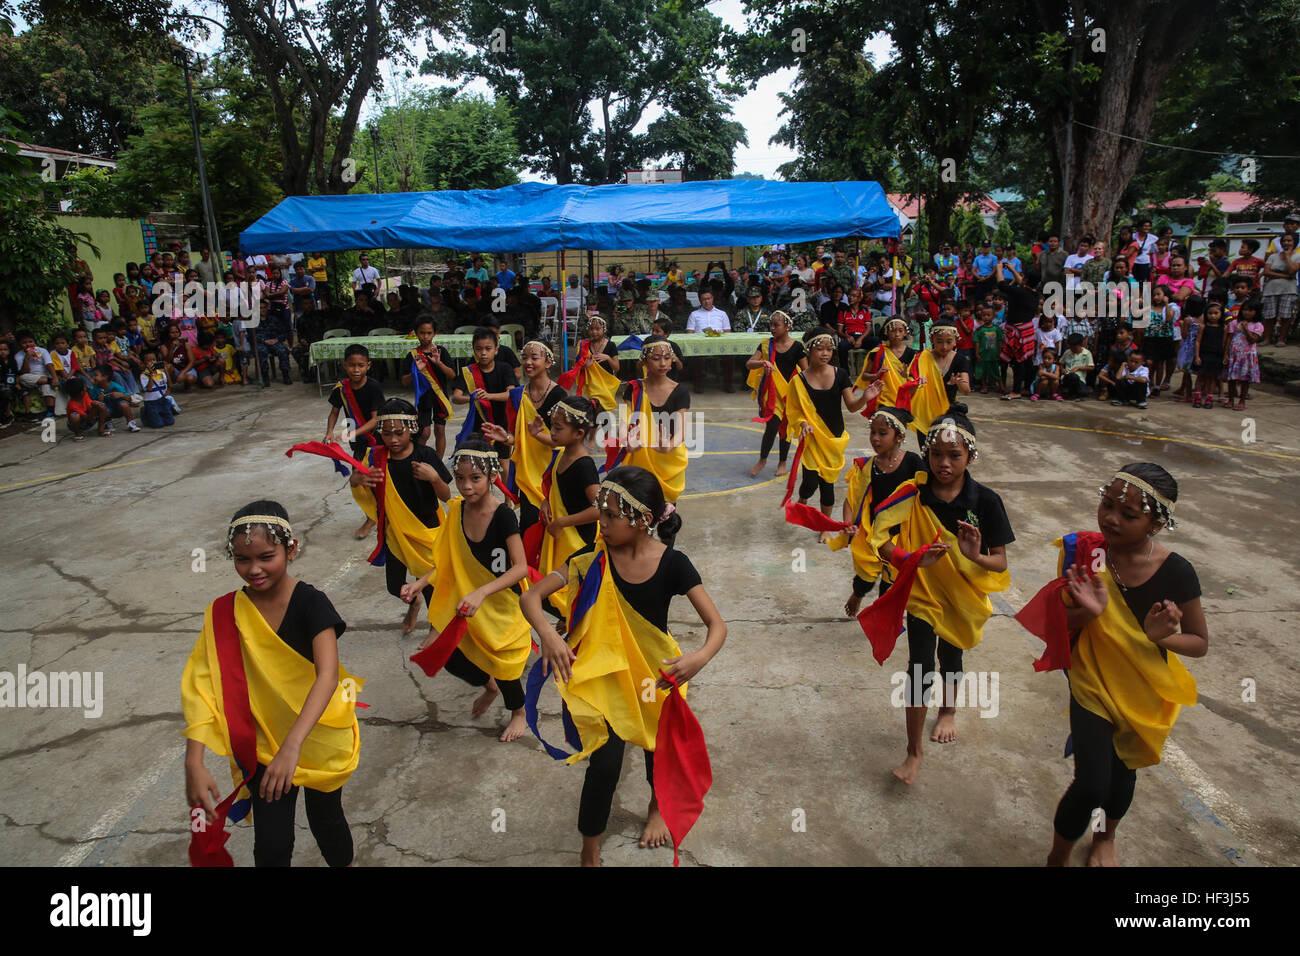 150811-M-GO800-039 SAN FERNANDO CITY, Philippines (Aug. 10, 2015) – Students at Boy-Utan Elementary School dance - Stock Image